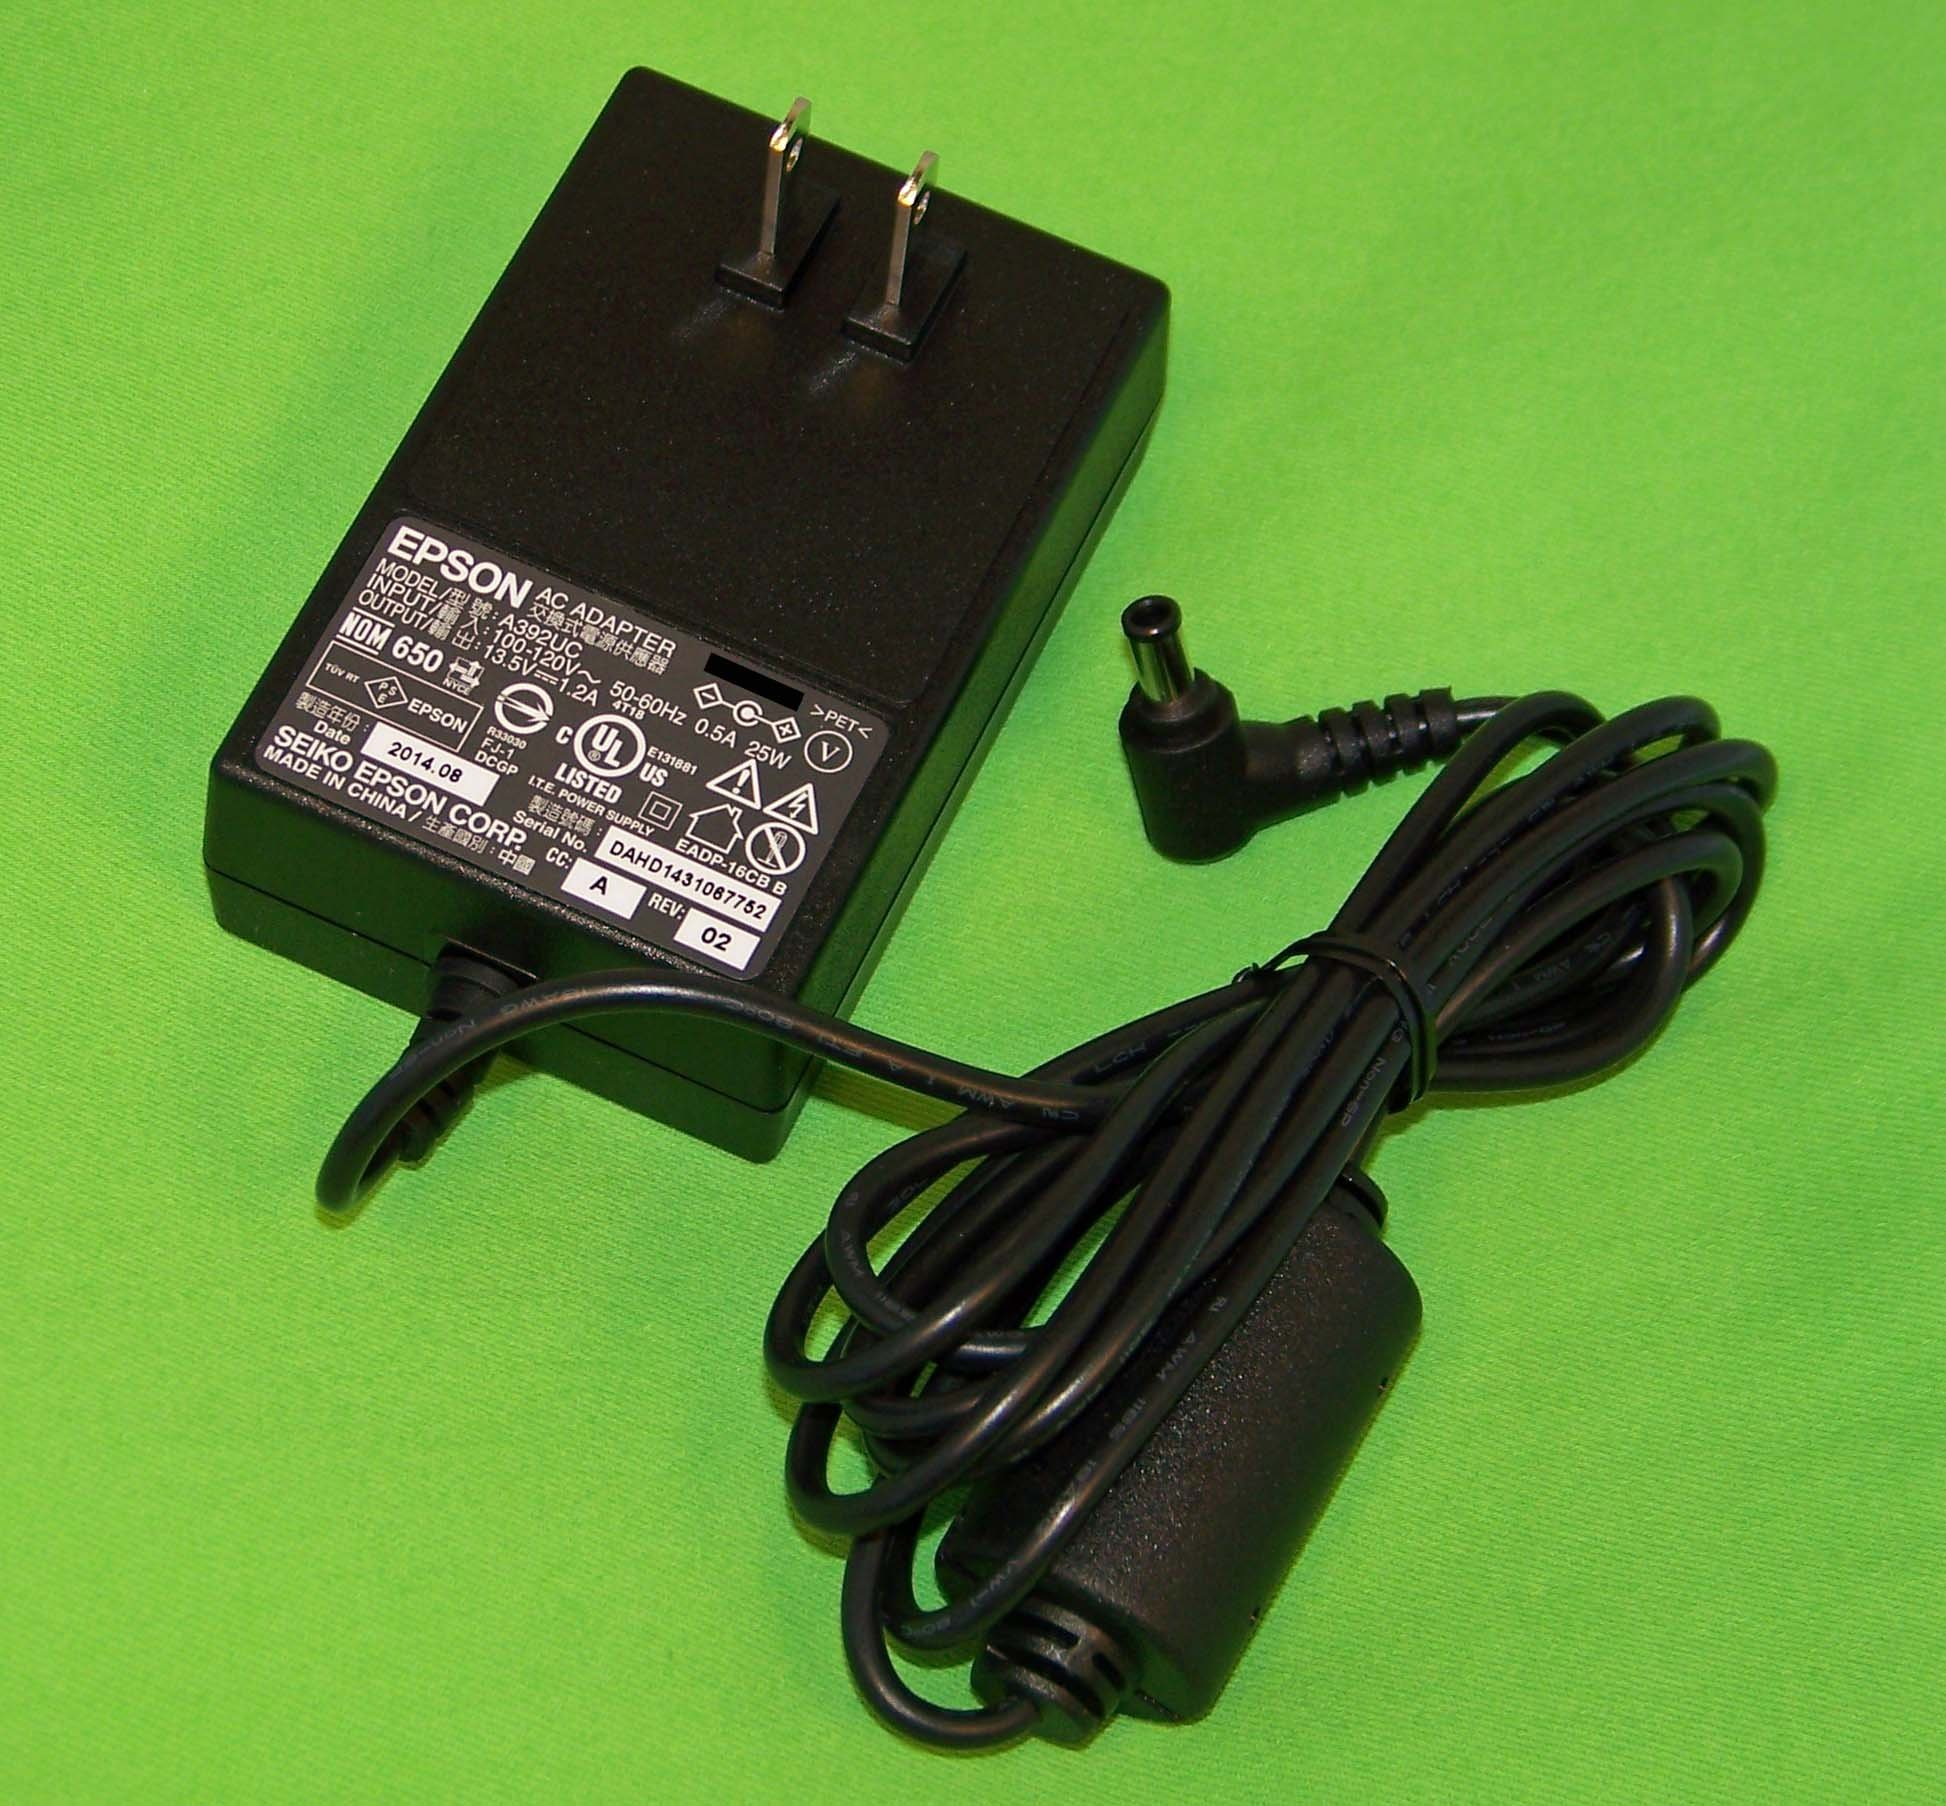 OEM Epson AC Adapter USA Only: Perfection V37, V370, V330, V33, V30, V300